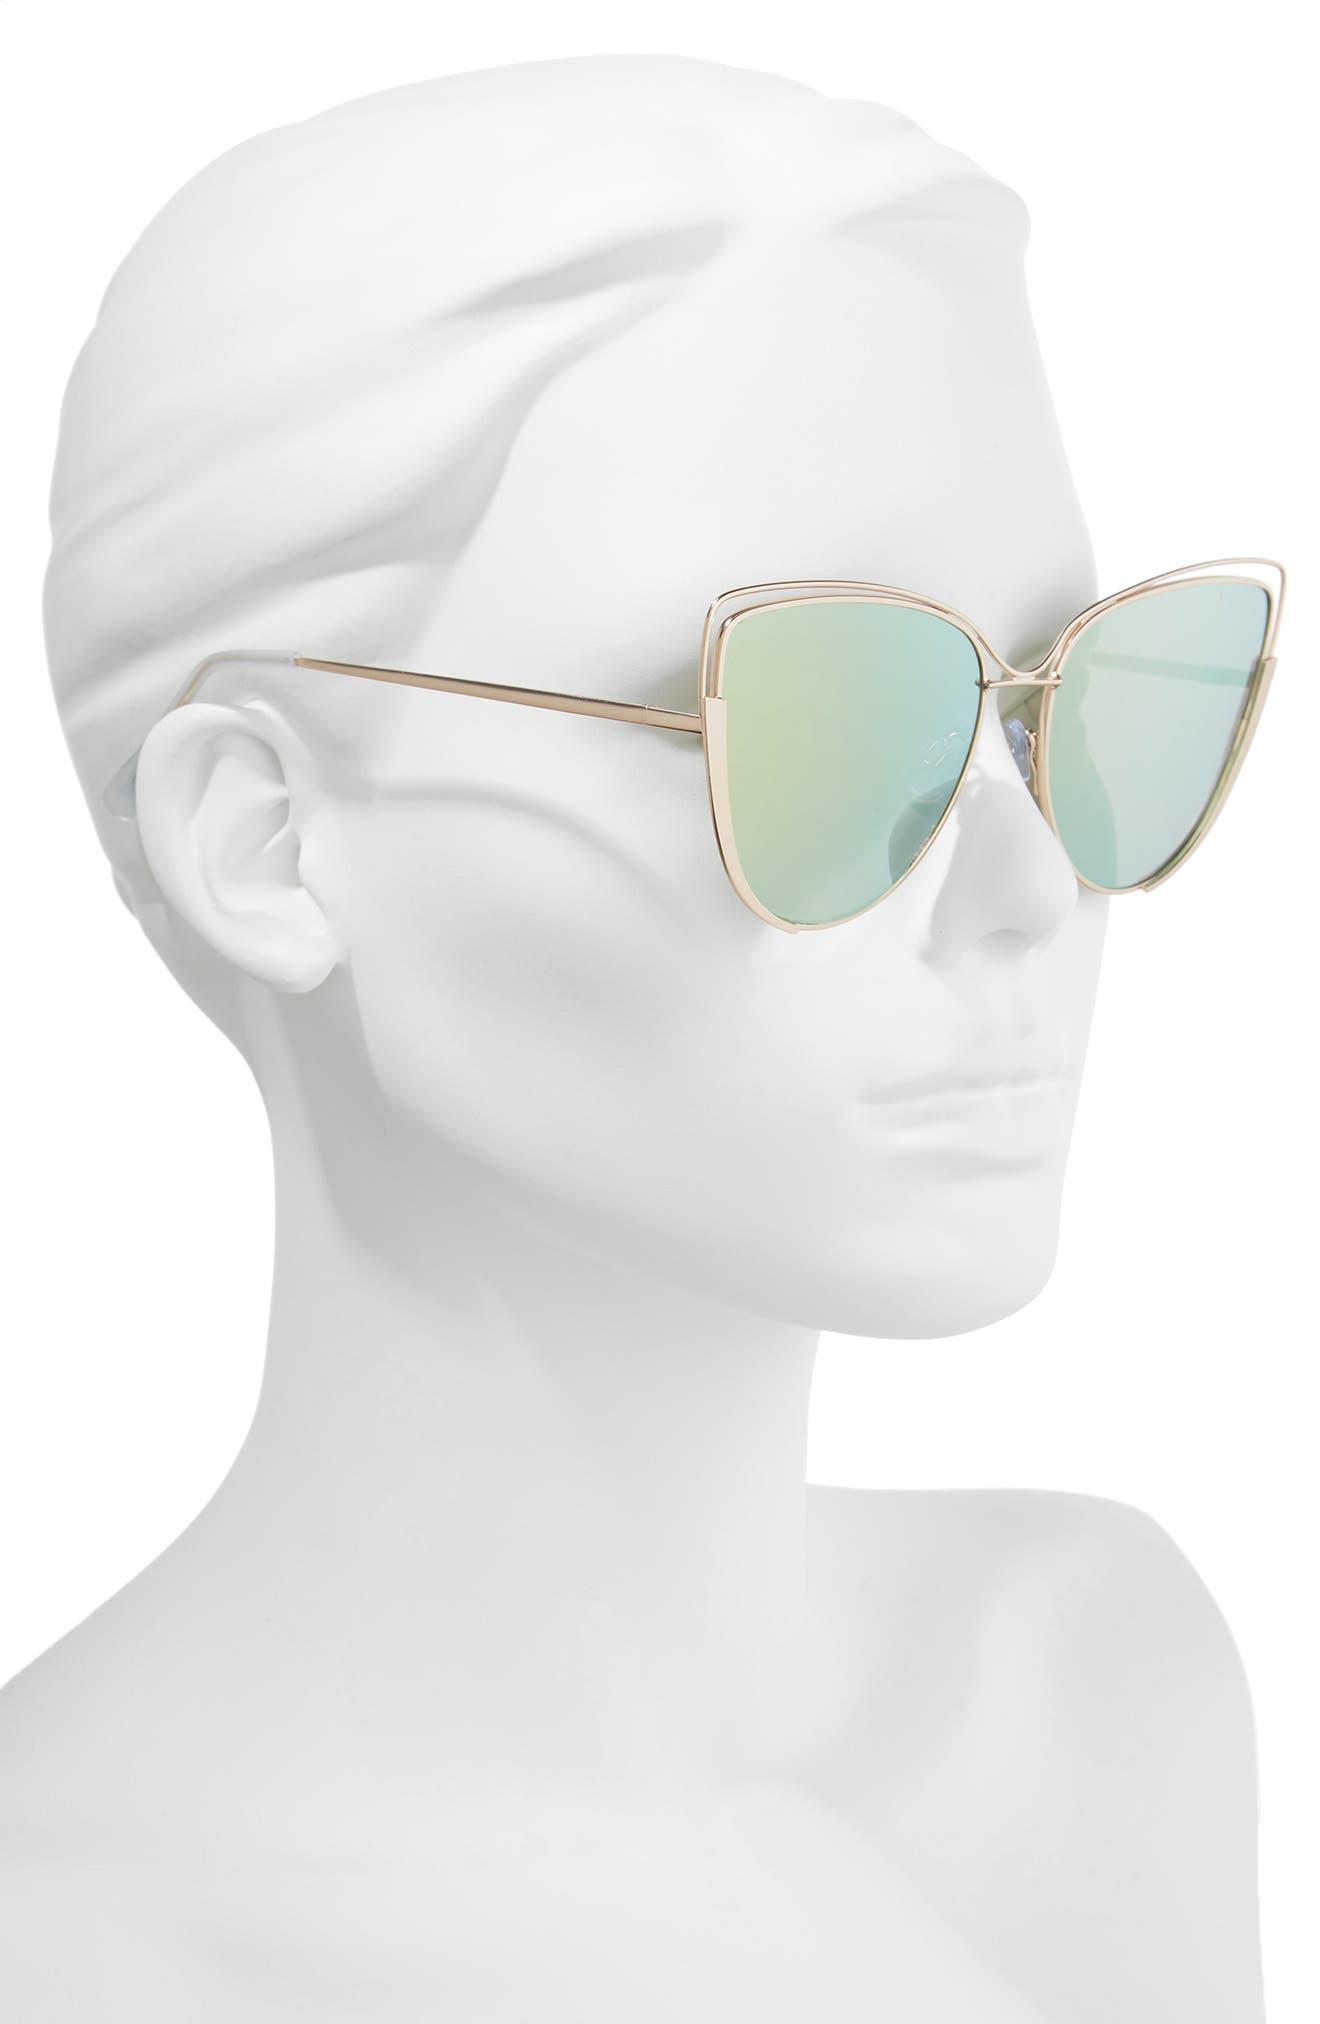 Futuristic Cat Eye Sunglasses,                             Alternate thumbnail 2, color,                             Gold